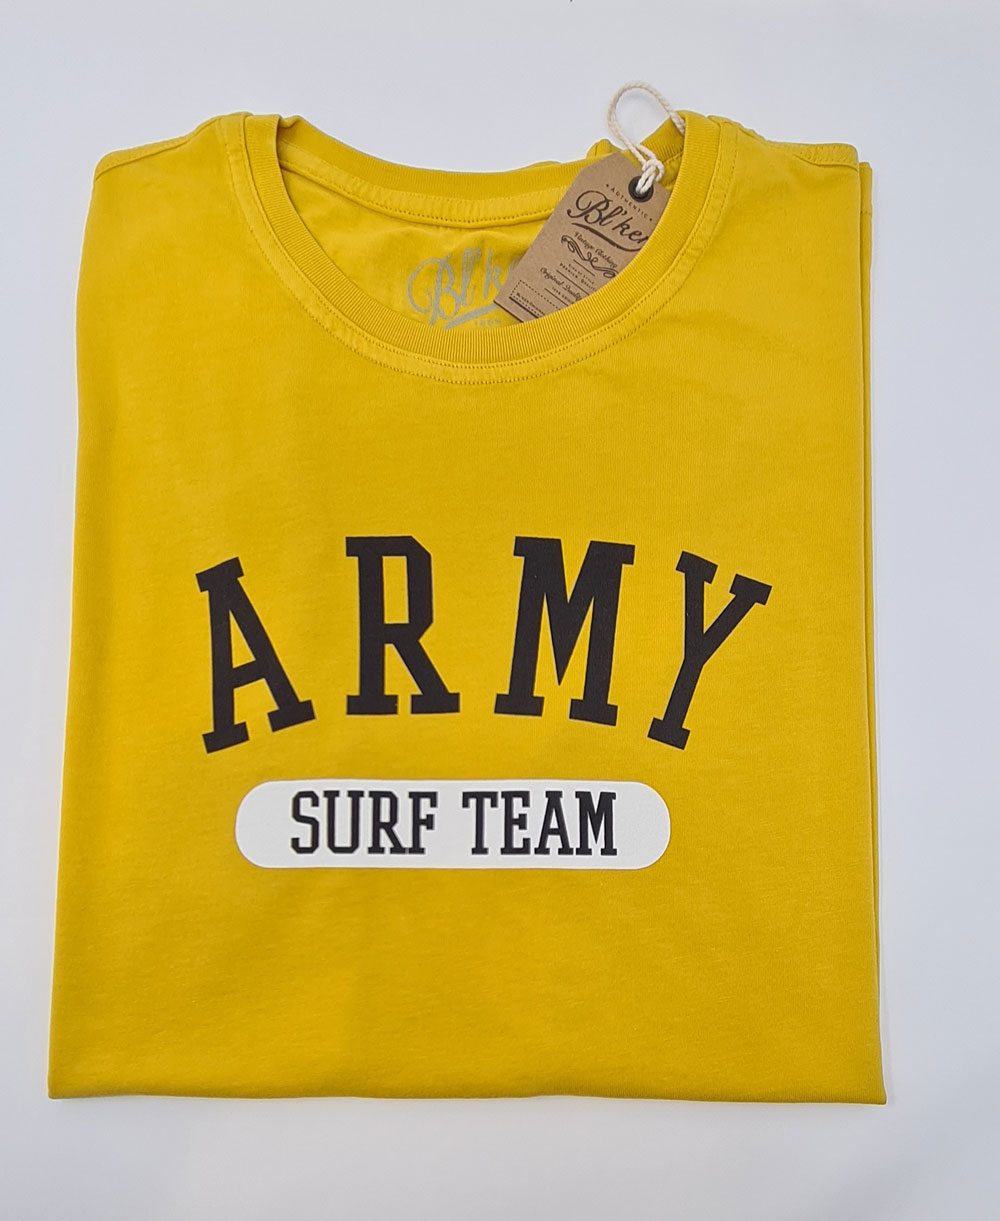 Herren Kurzarm T-Shirt Army Surf Team Yellow